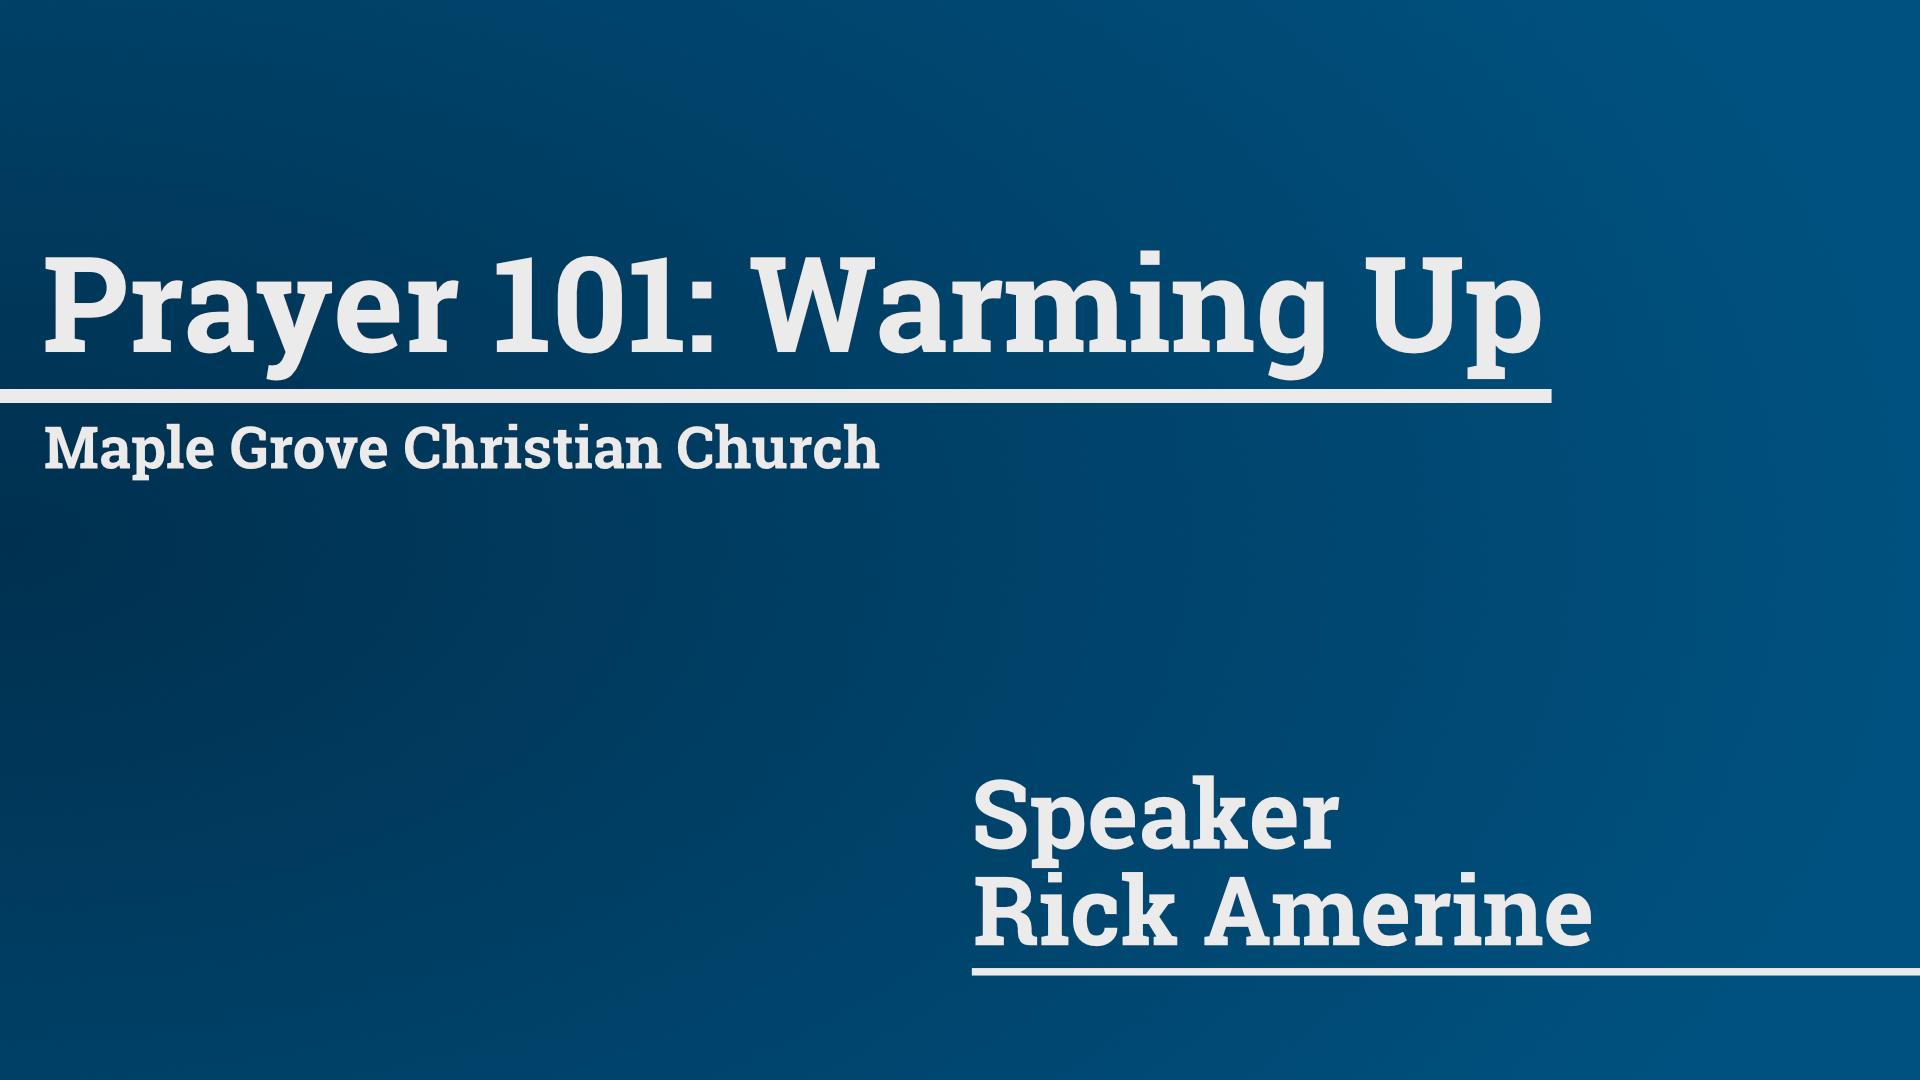 Prayer 101 Warming Up.jpg